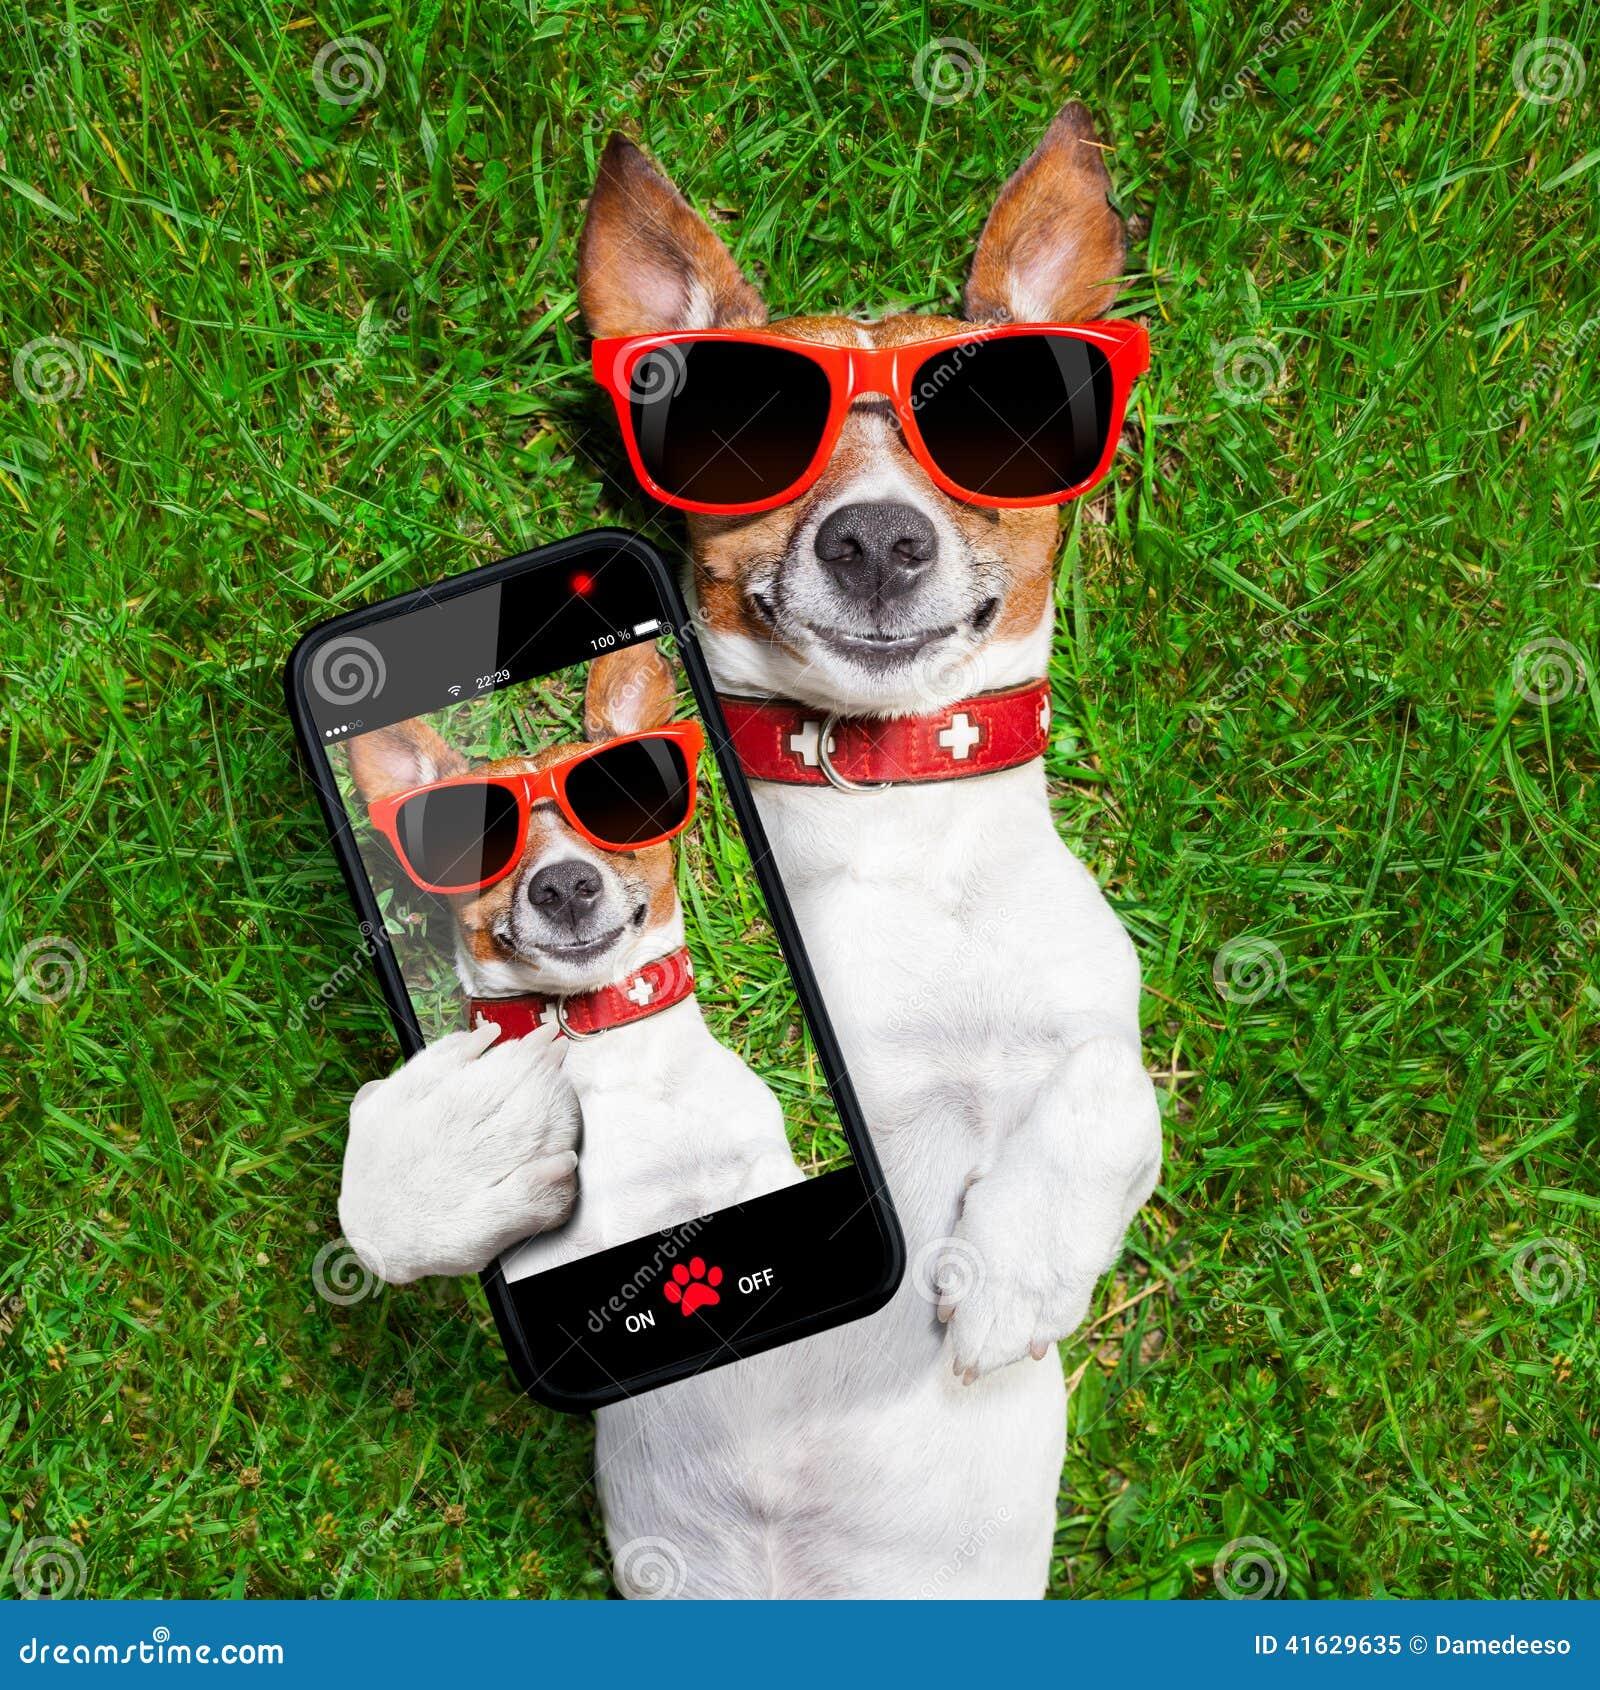 chien dr le de selfie image stock image du animal t l phone 41629635. Black Bedroom Furniture Sets. Home Design Ideas